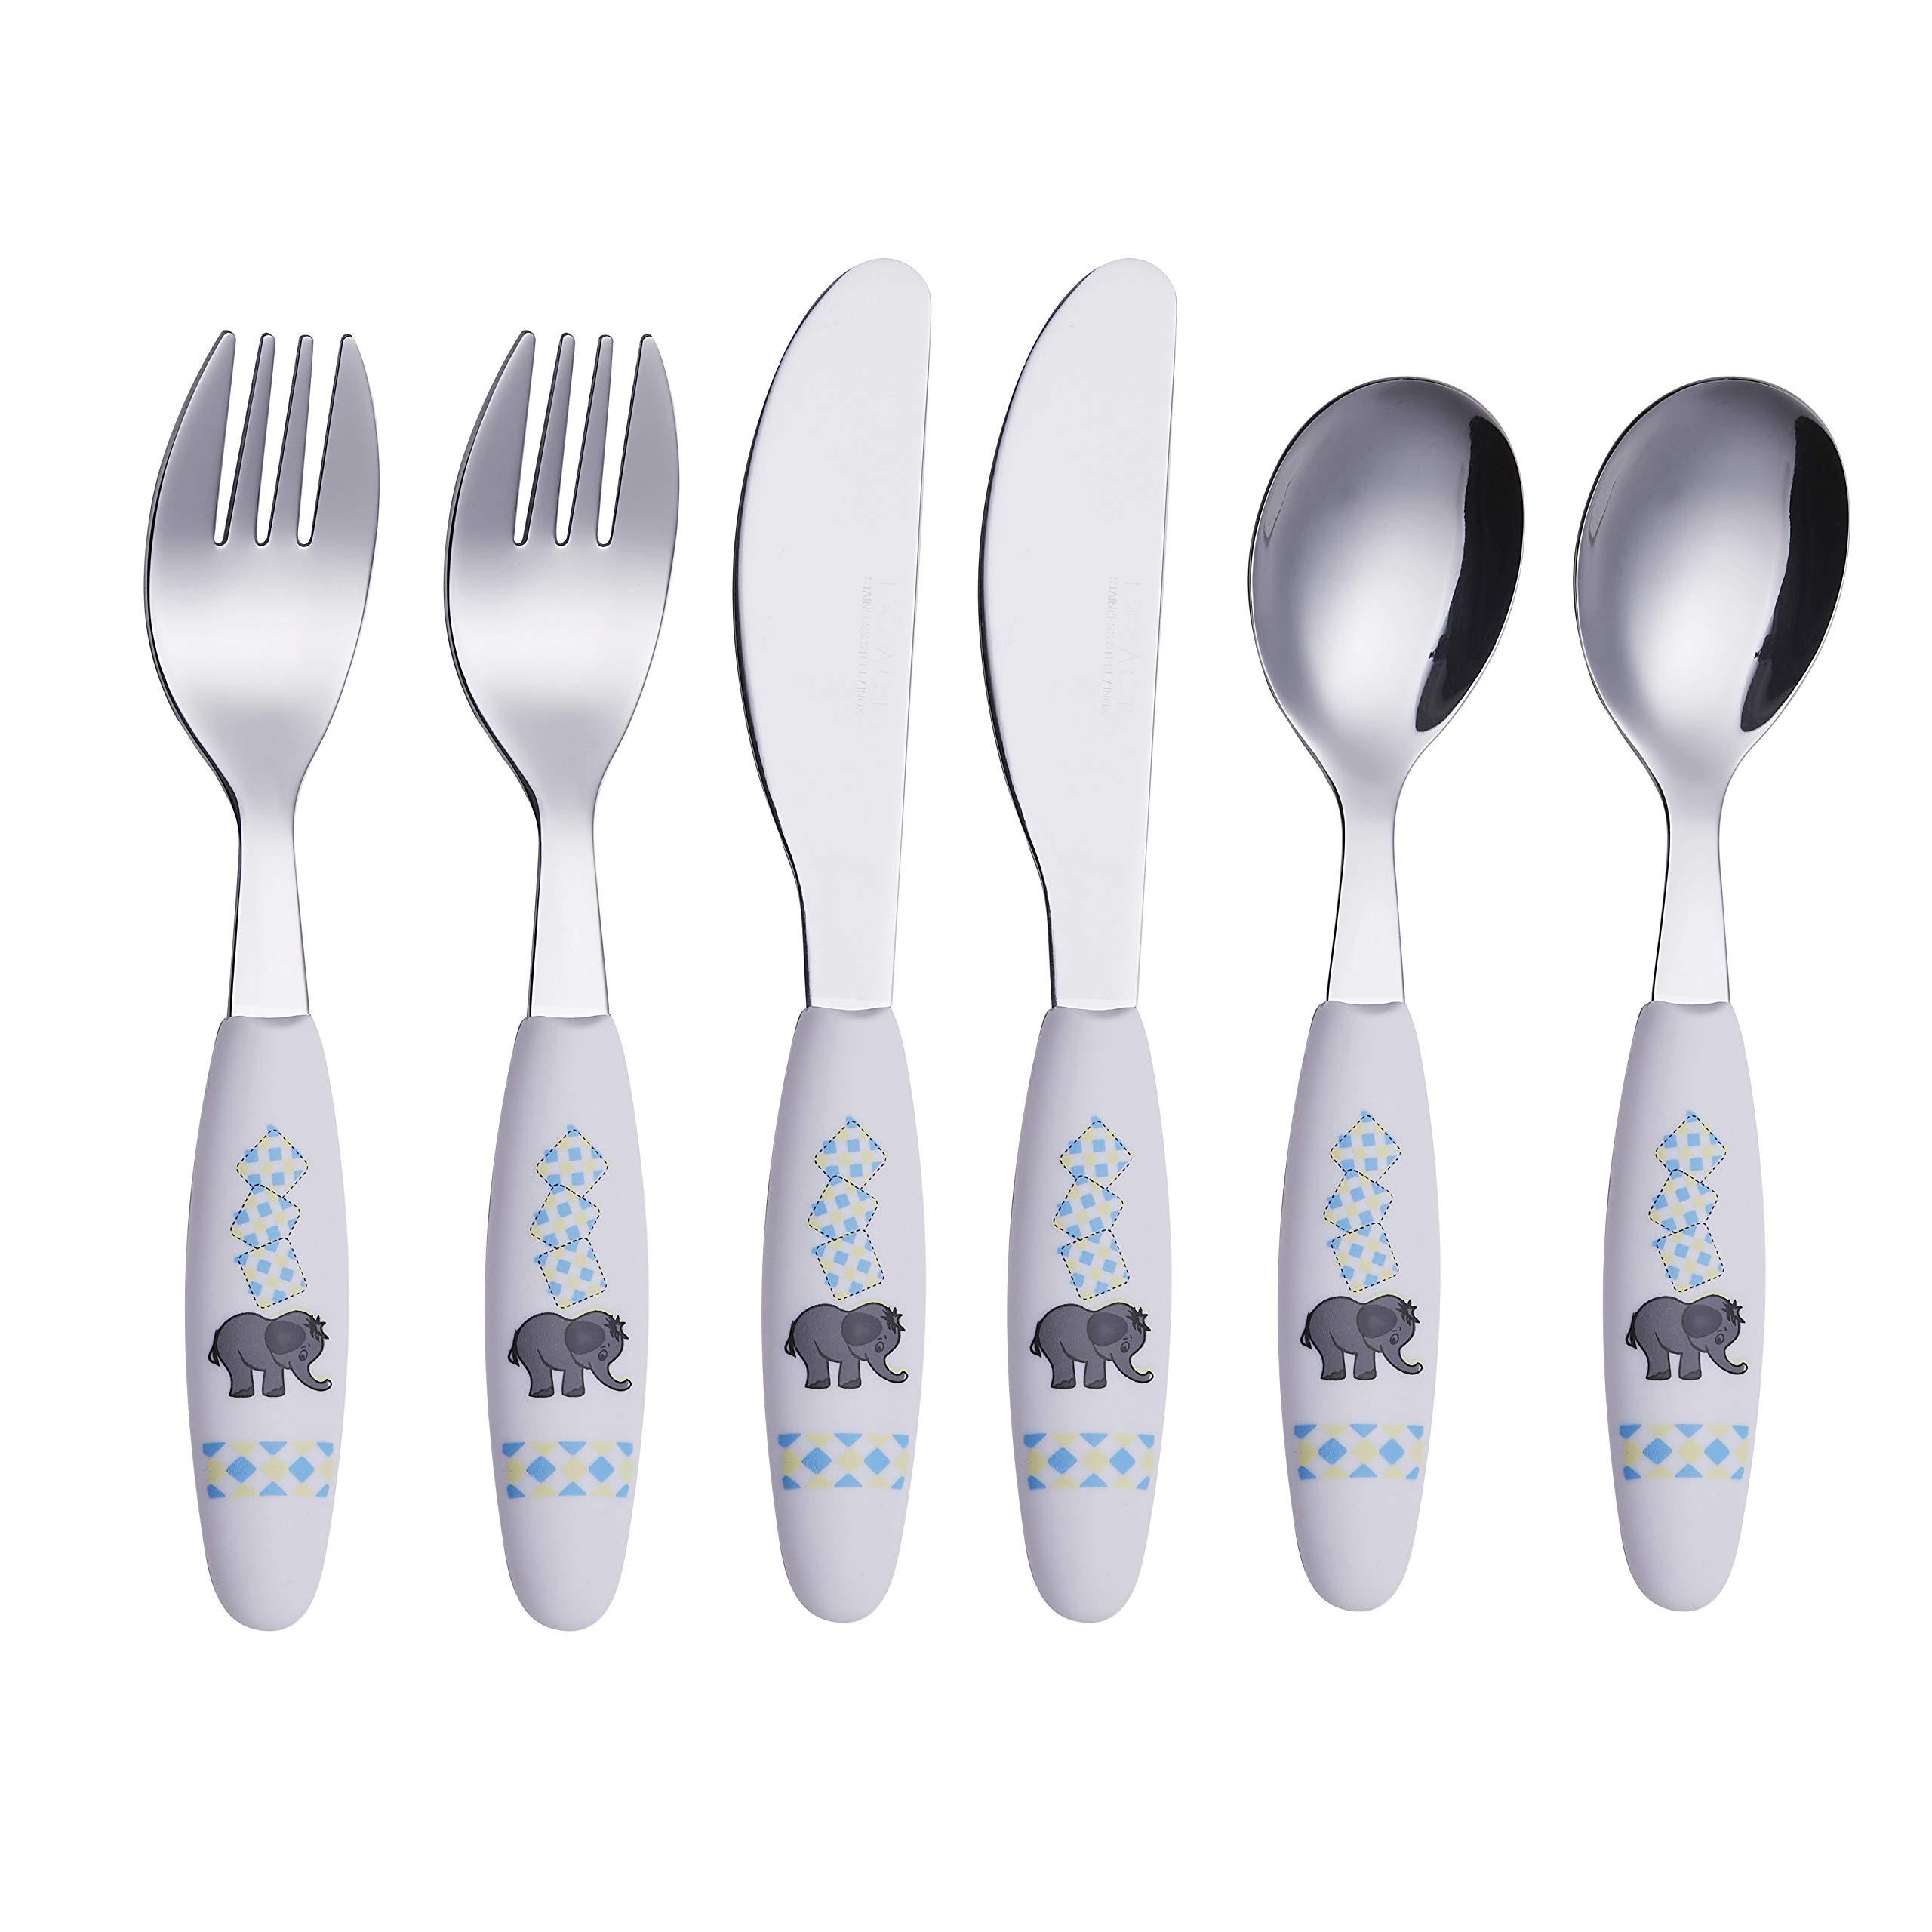 Exzact - 6 Pieza para niños cubertería - 2 x Cena Cuchillo, 2 x Cena Tenedor, 2 x Cena cuchar (Elefante x 6) product image